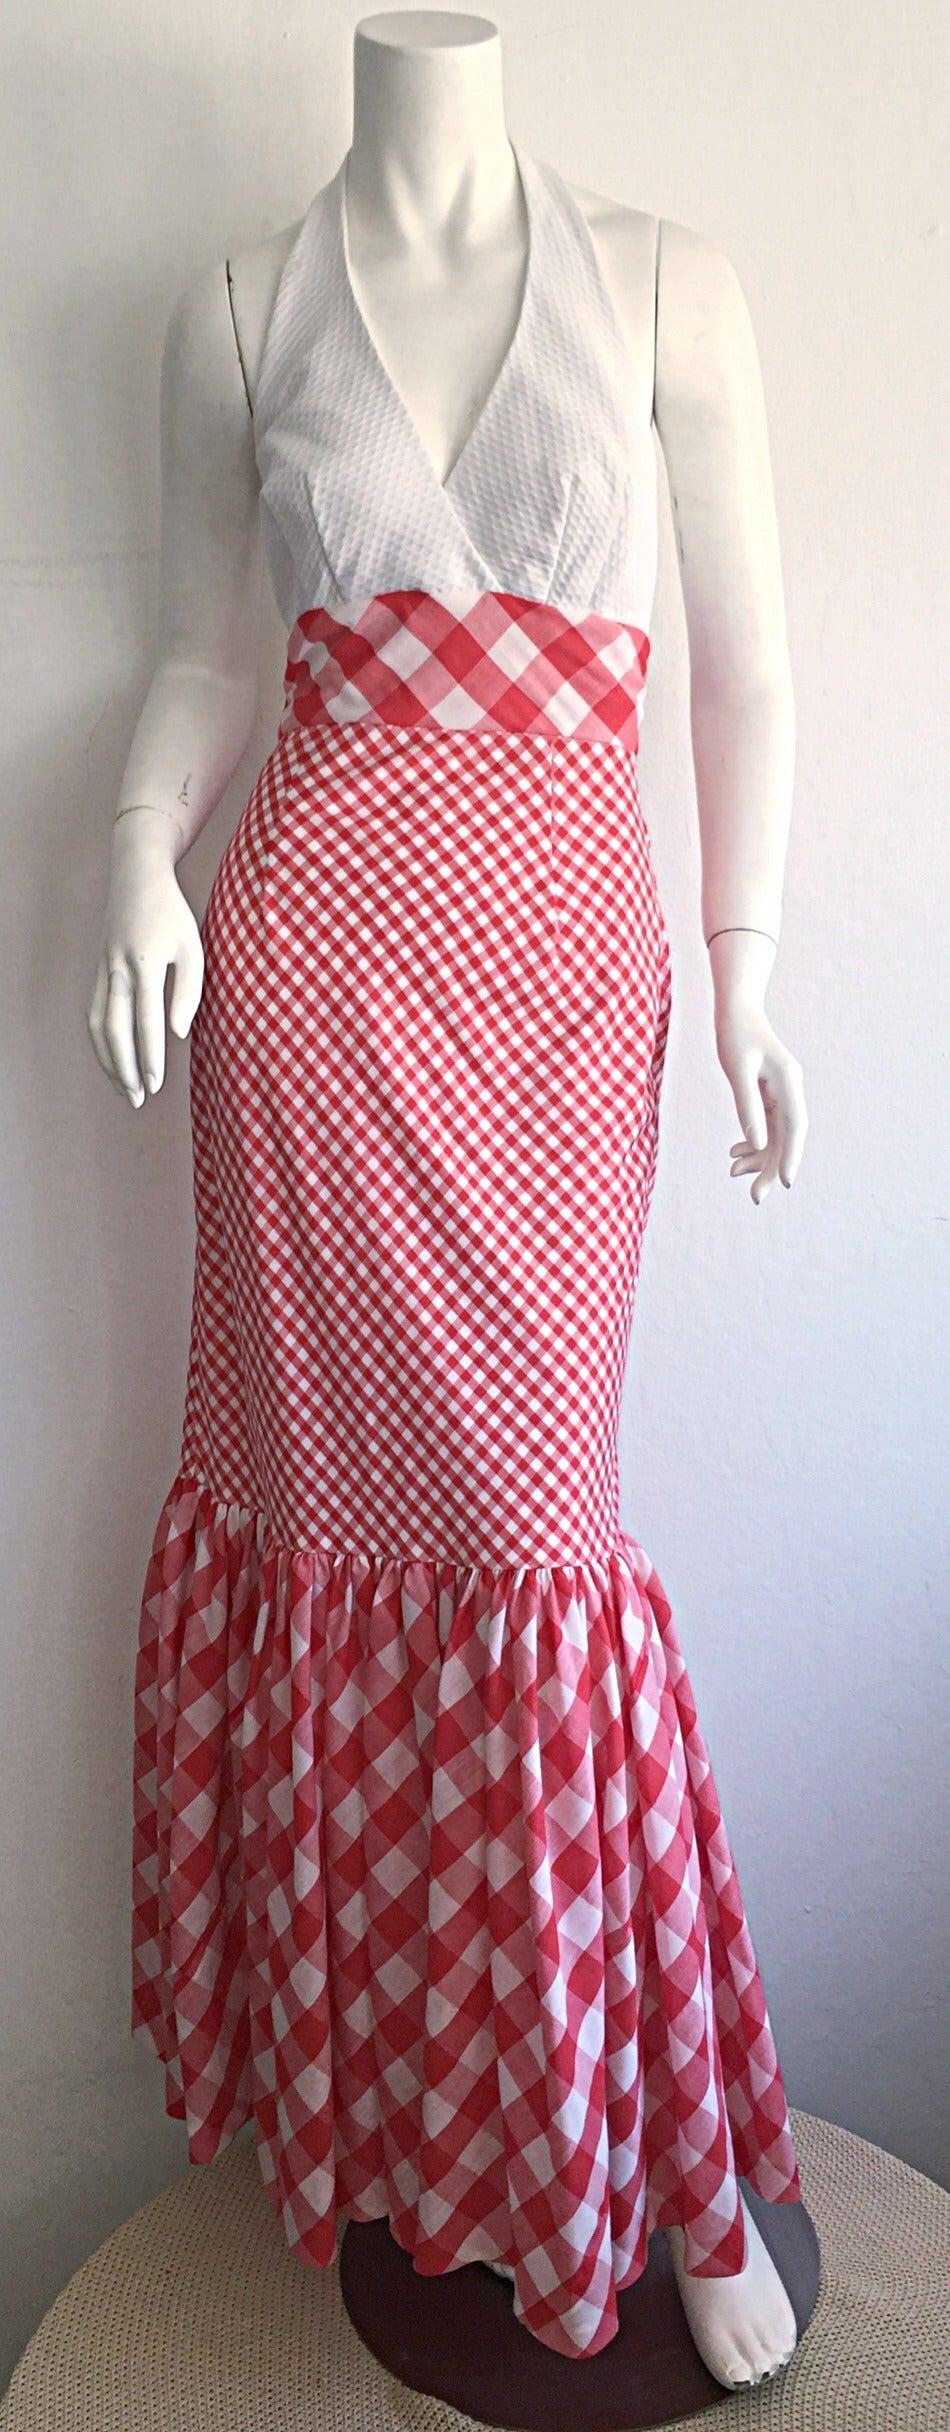 Vintage 1970s Red + White ' Picnic Table ' Plaid Cotton Halter Maxi Dress 8